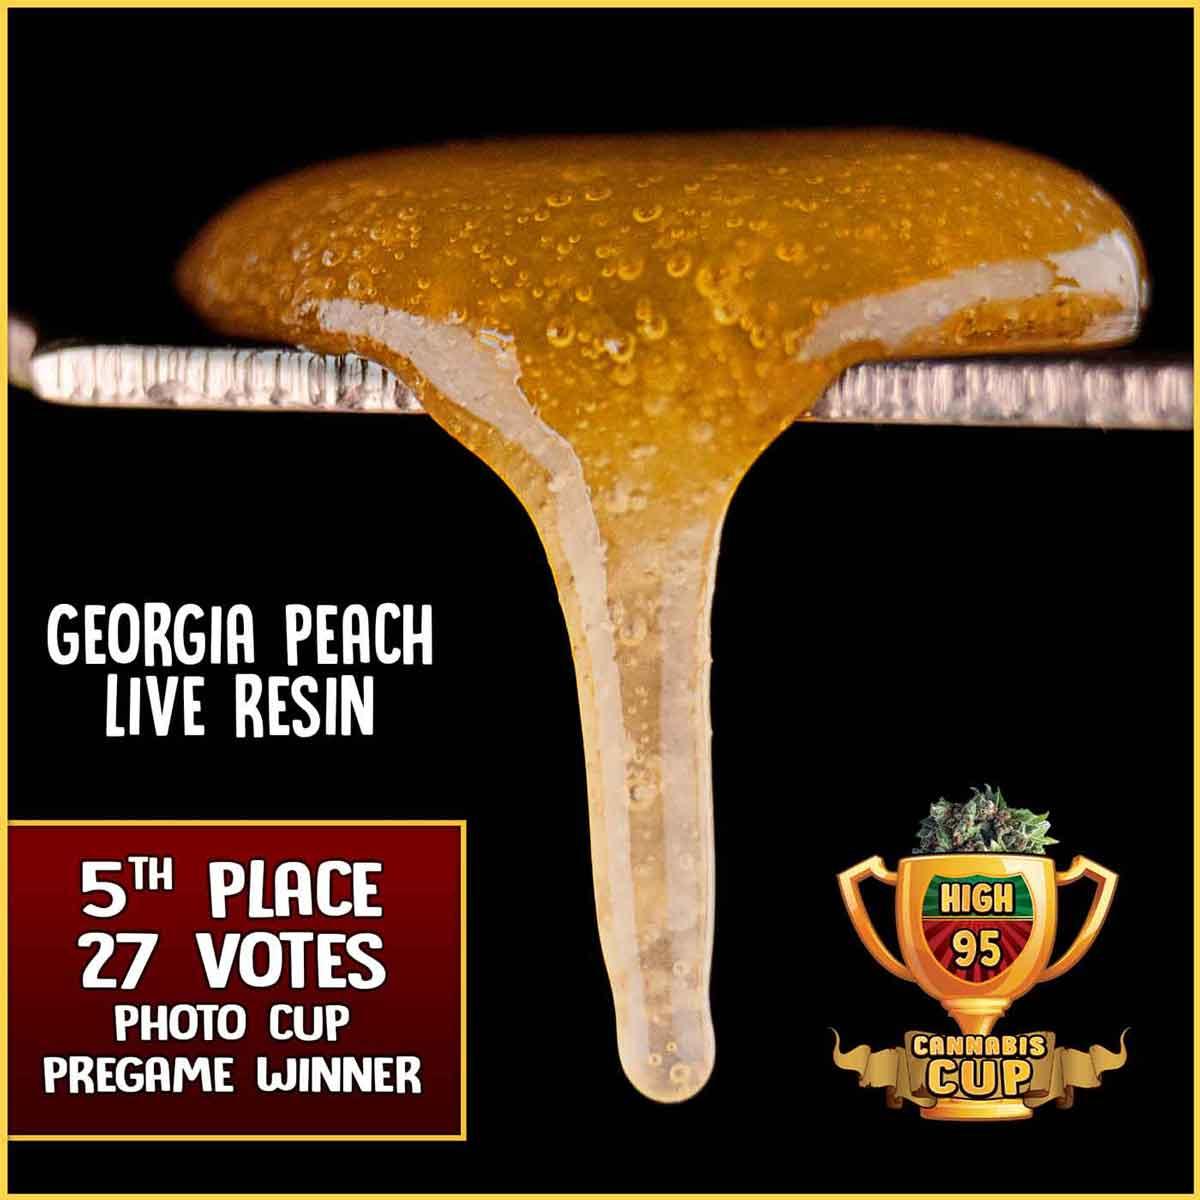 High 95 Photo Cup 5th Place Pregame